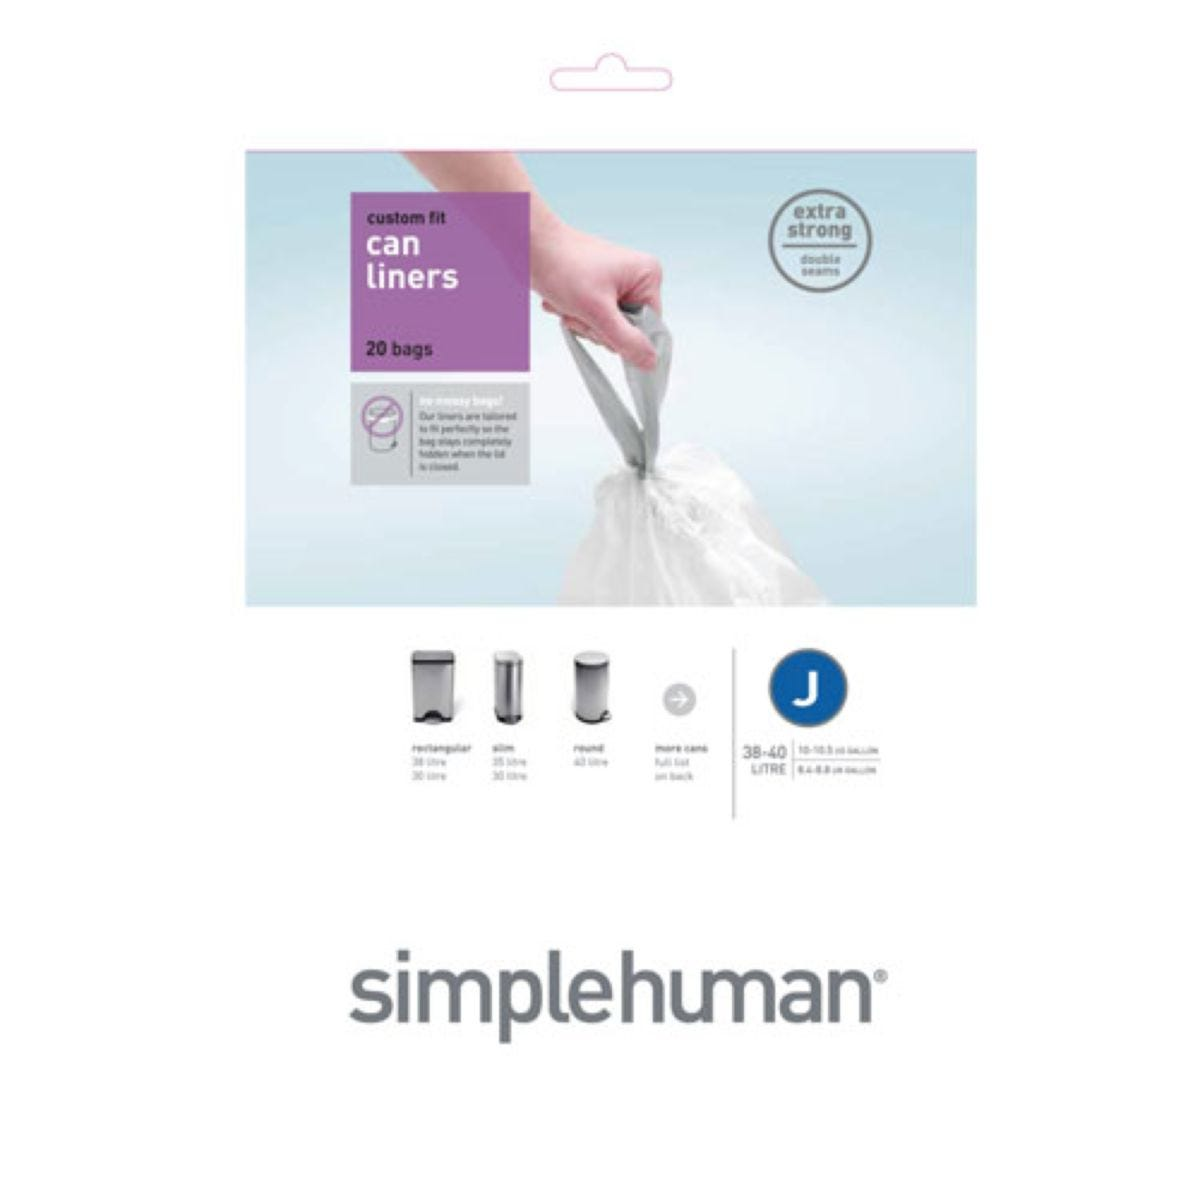 Simplehuman Custom Fit 40L Size J Bin Liners - Pack of 20